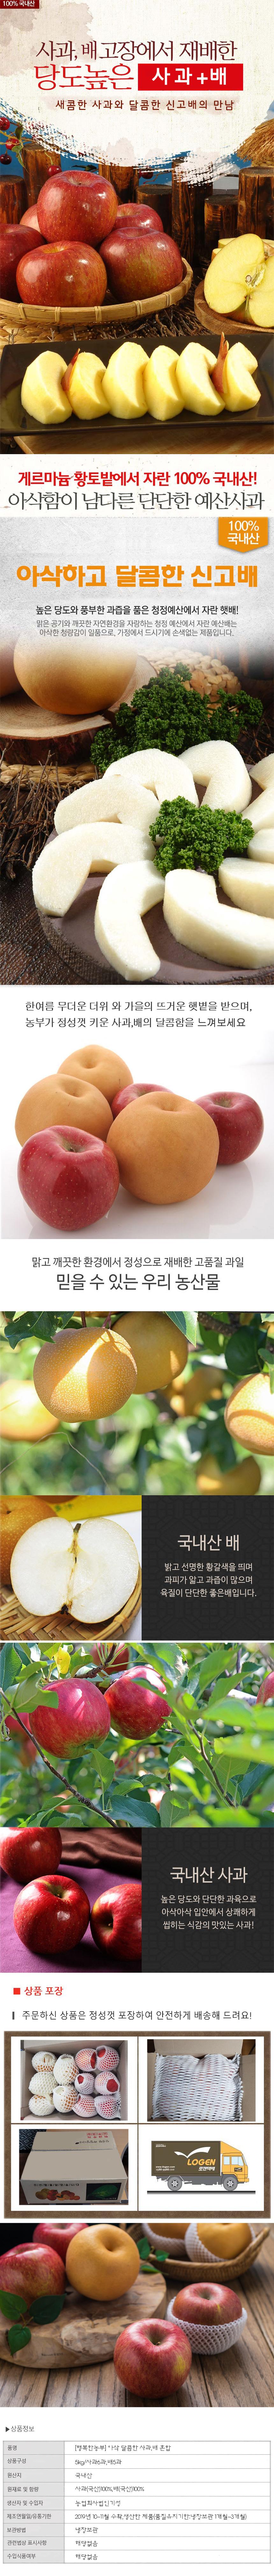 happyparm_page_apple+pear_5kg.jpg